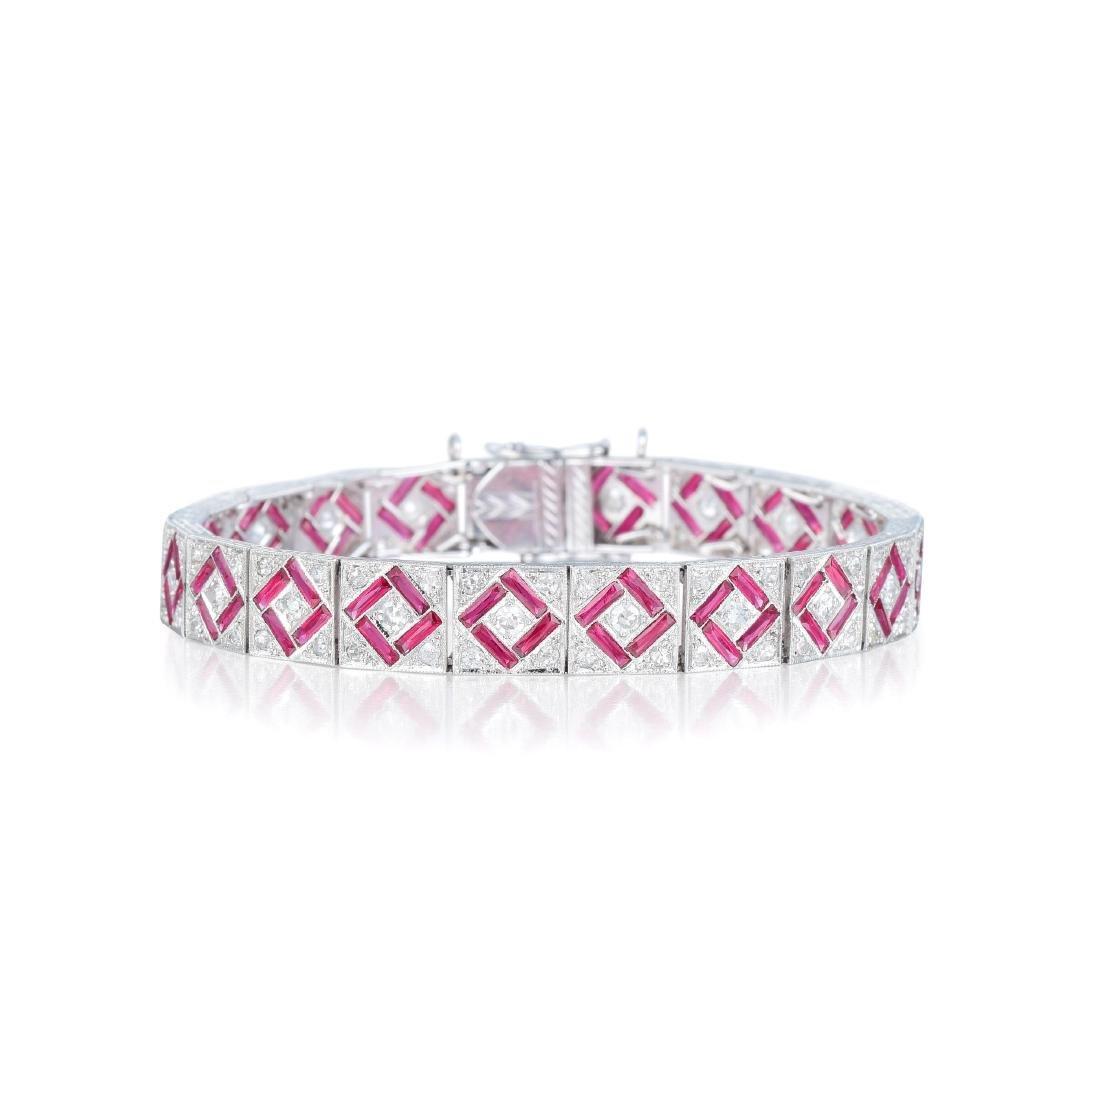 An Art Deco Style Ruby and Diamond Bracelet